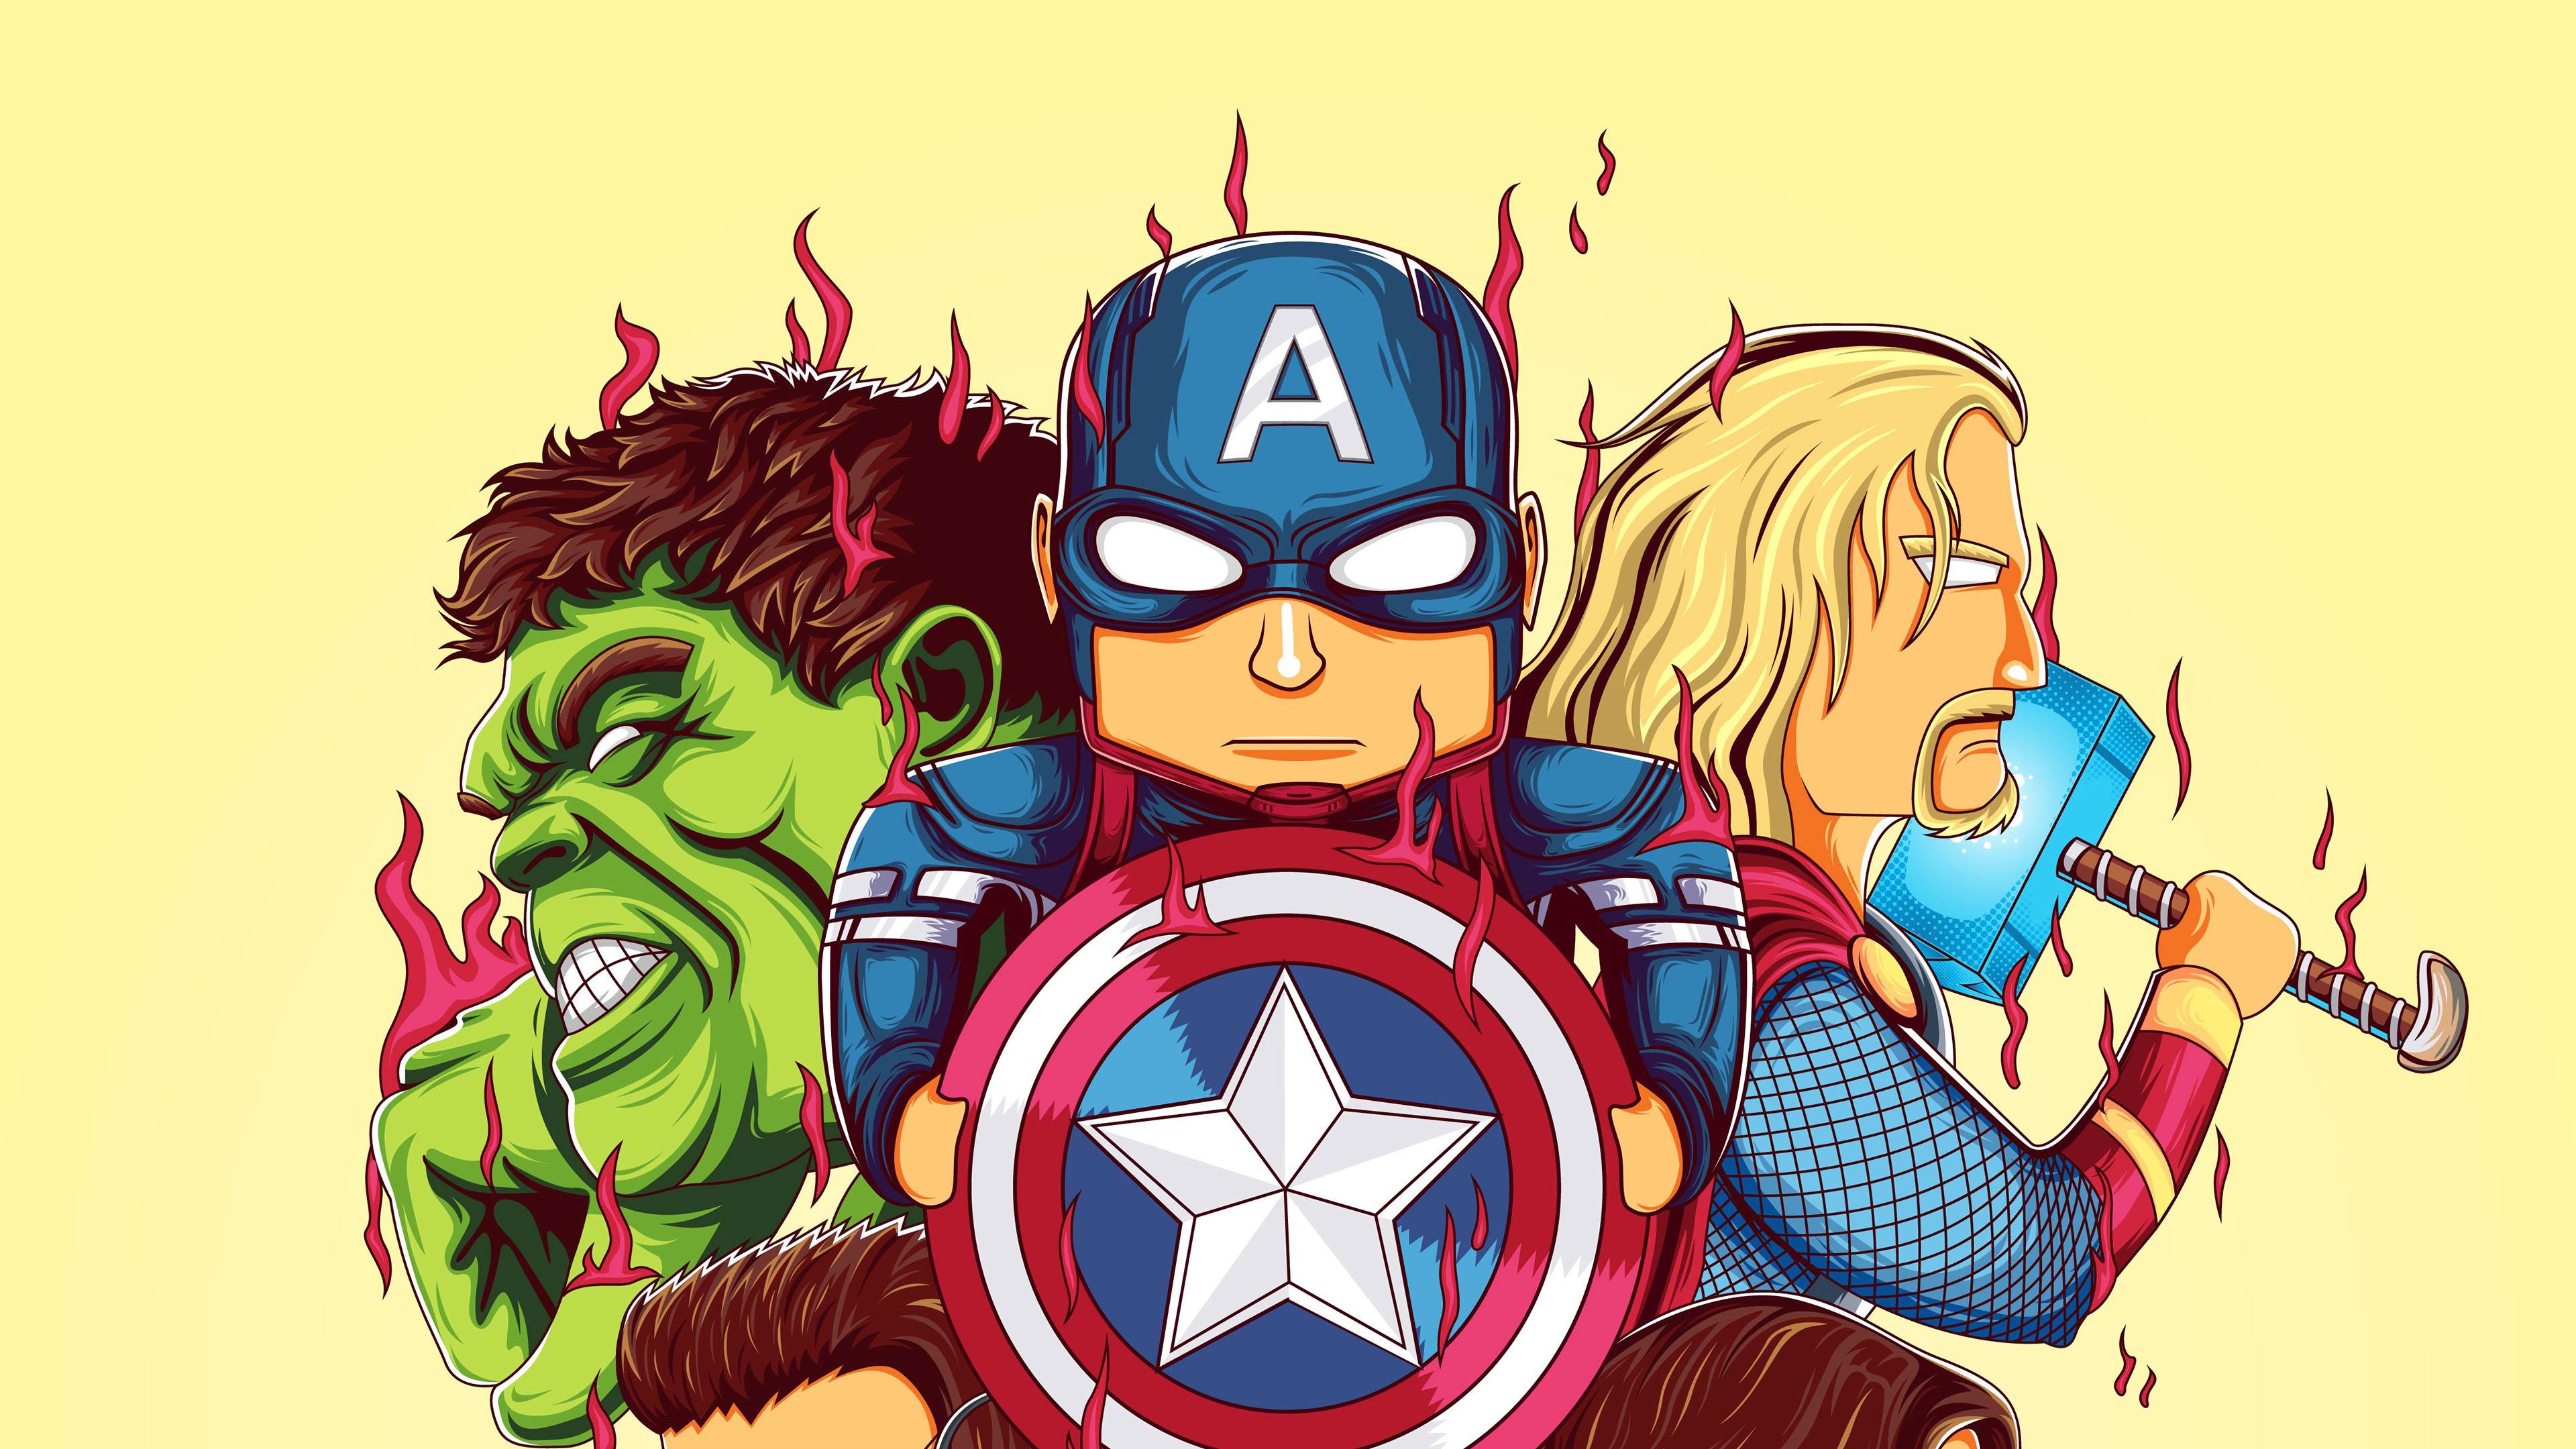 Little Avengers 4k, HD Superheroes, 4k Wallpapers, Images